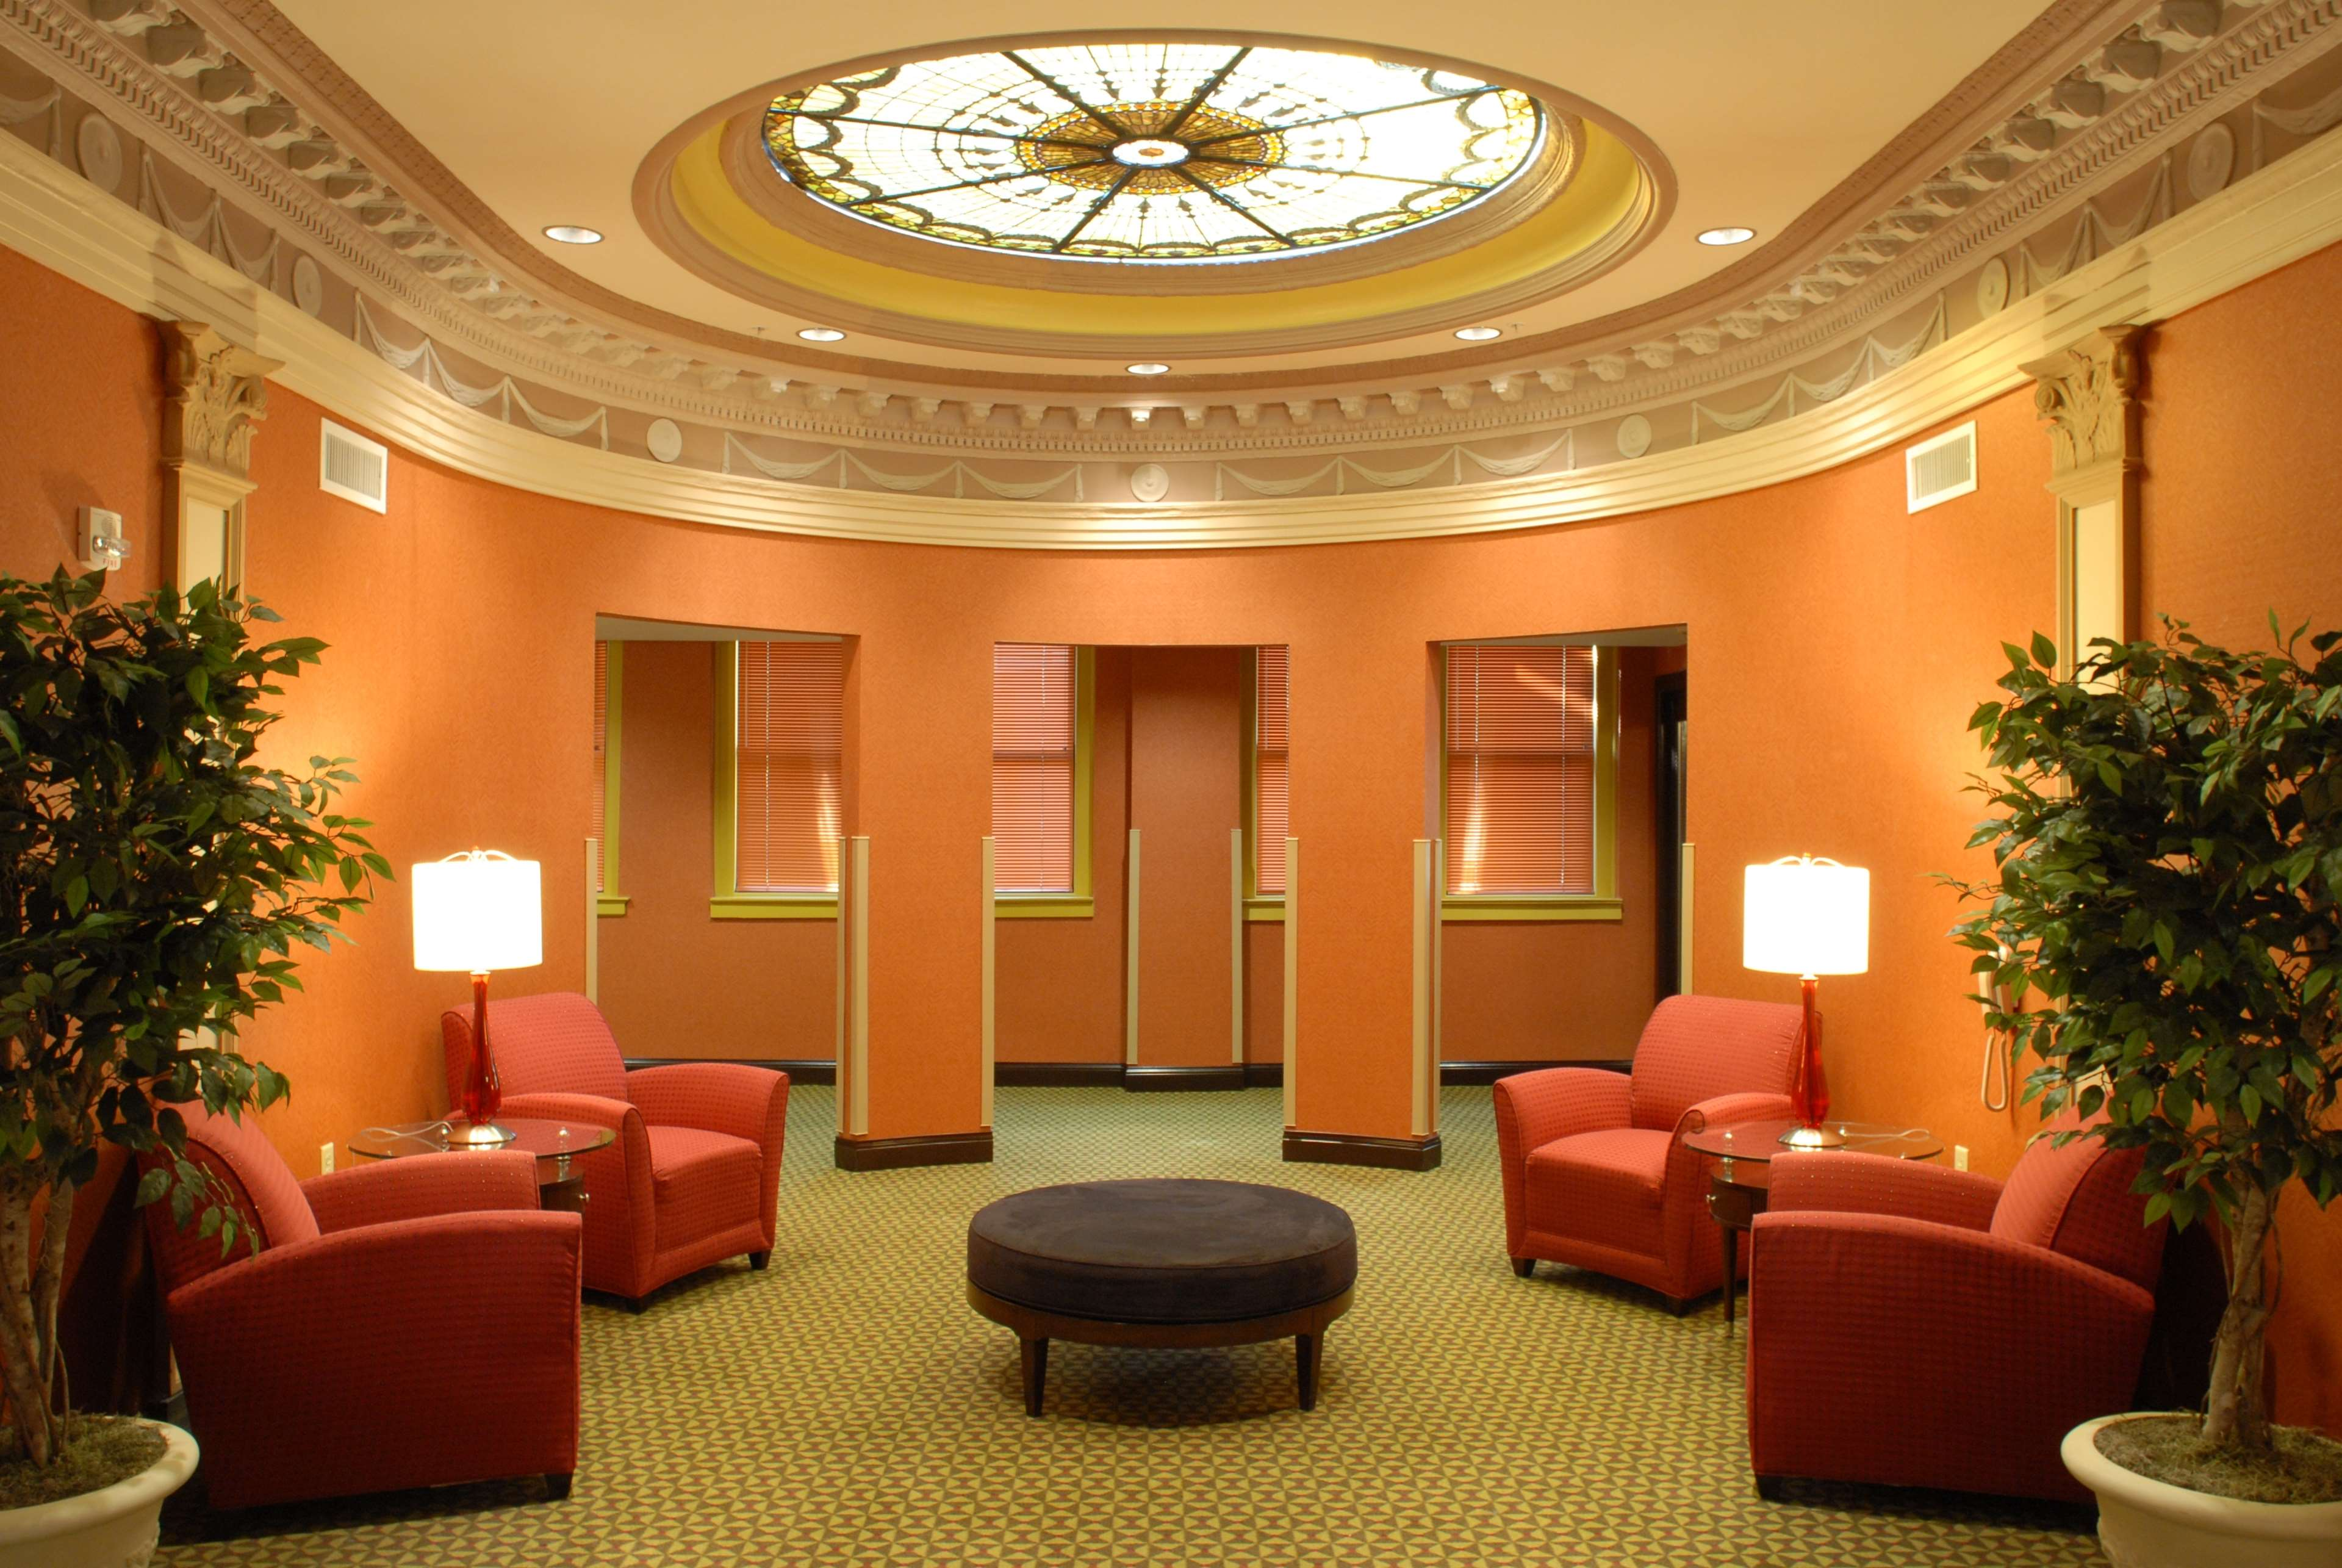 Homewood Suites by Hilton Nashville-Downtown image 3